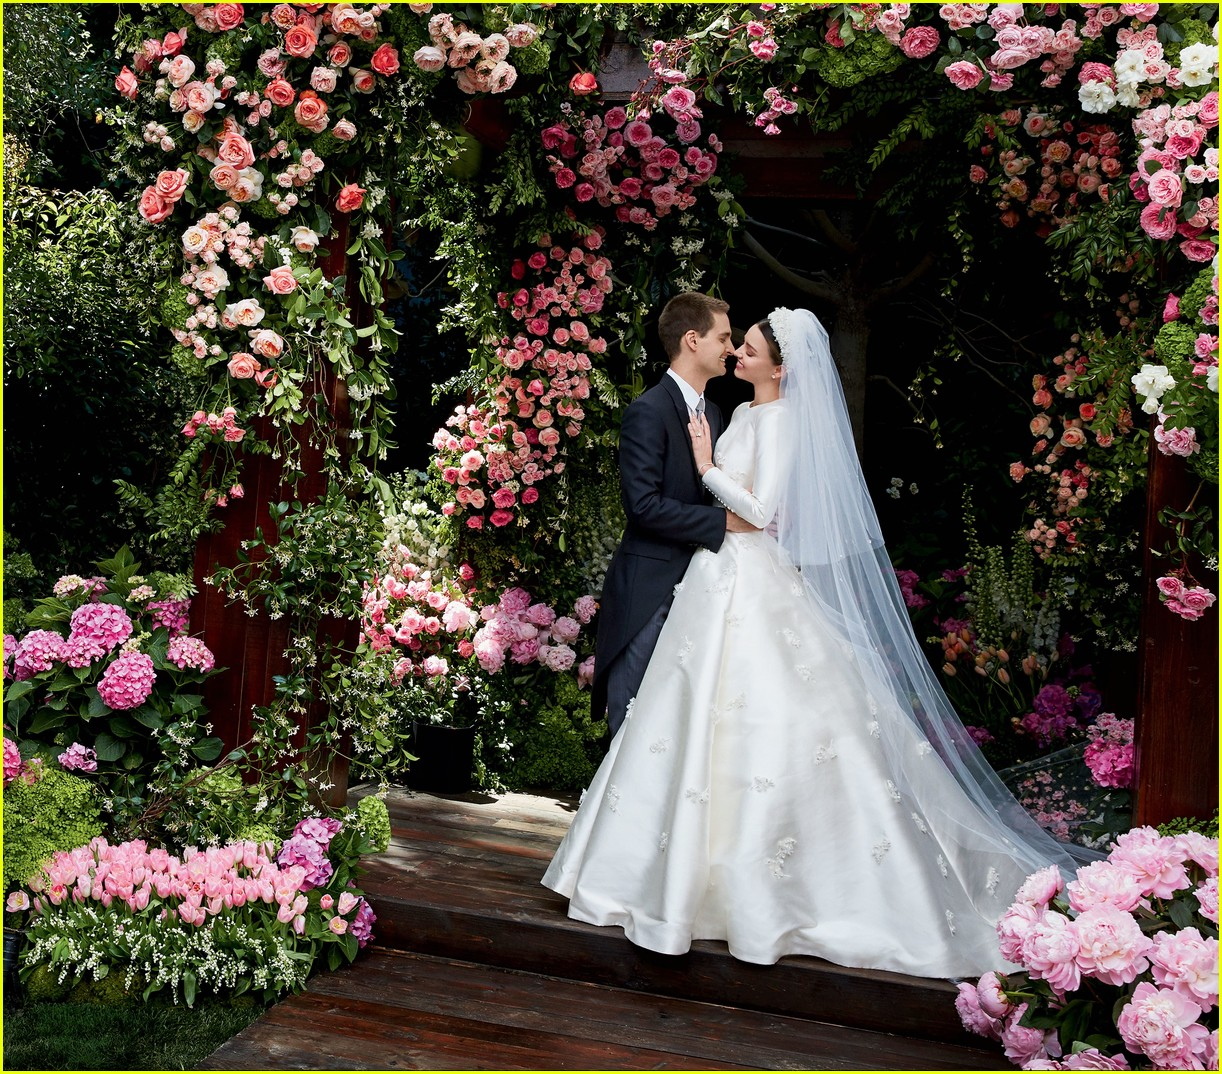 miranda kerr evan spiegel wedding photos 013929056